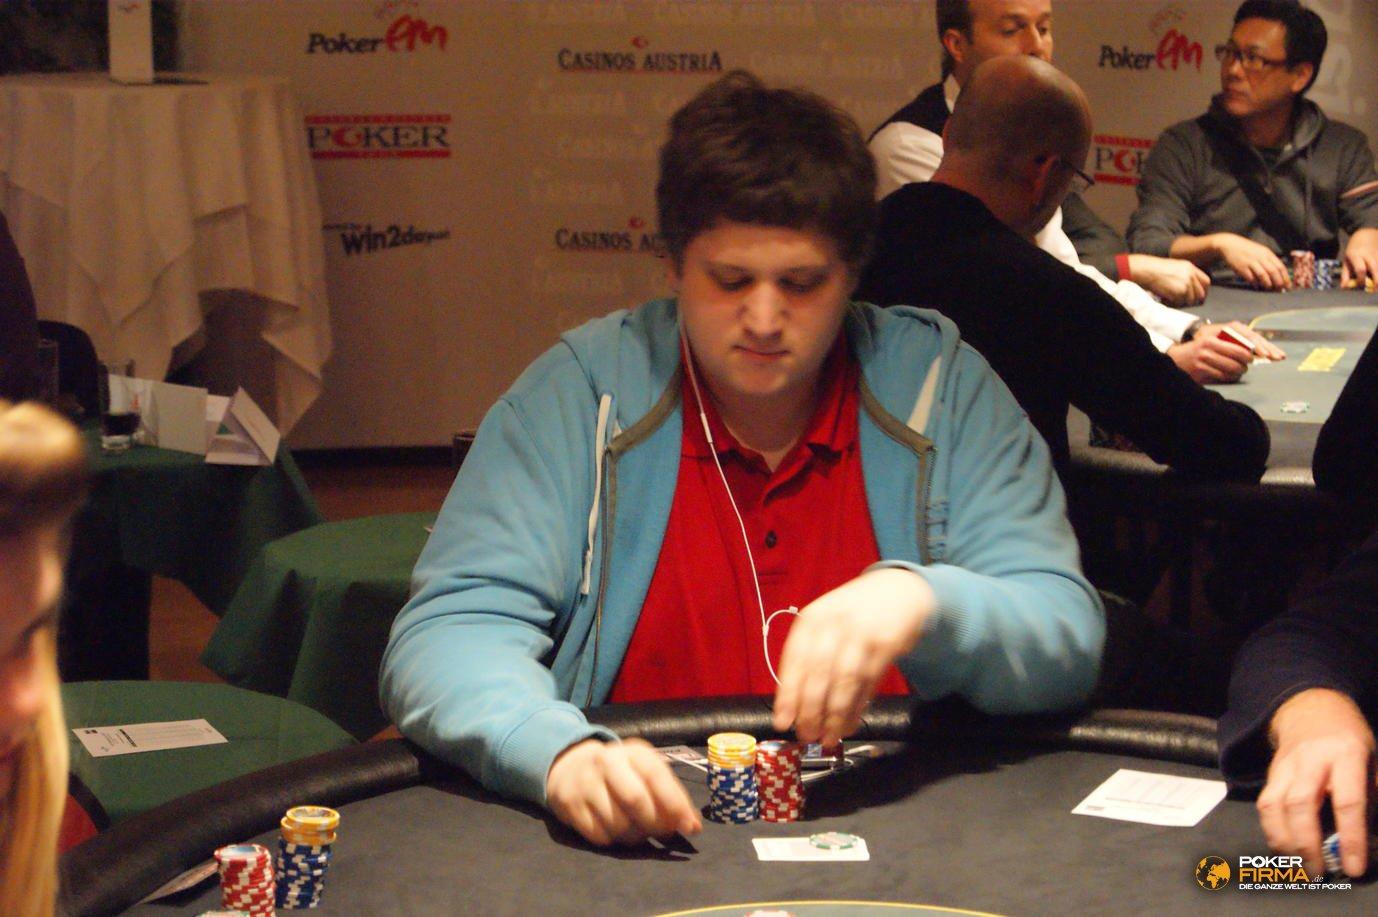 Poker_EM_2000_NLH_251011_Mario_Puccini